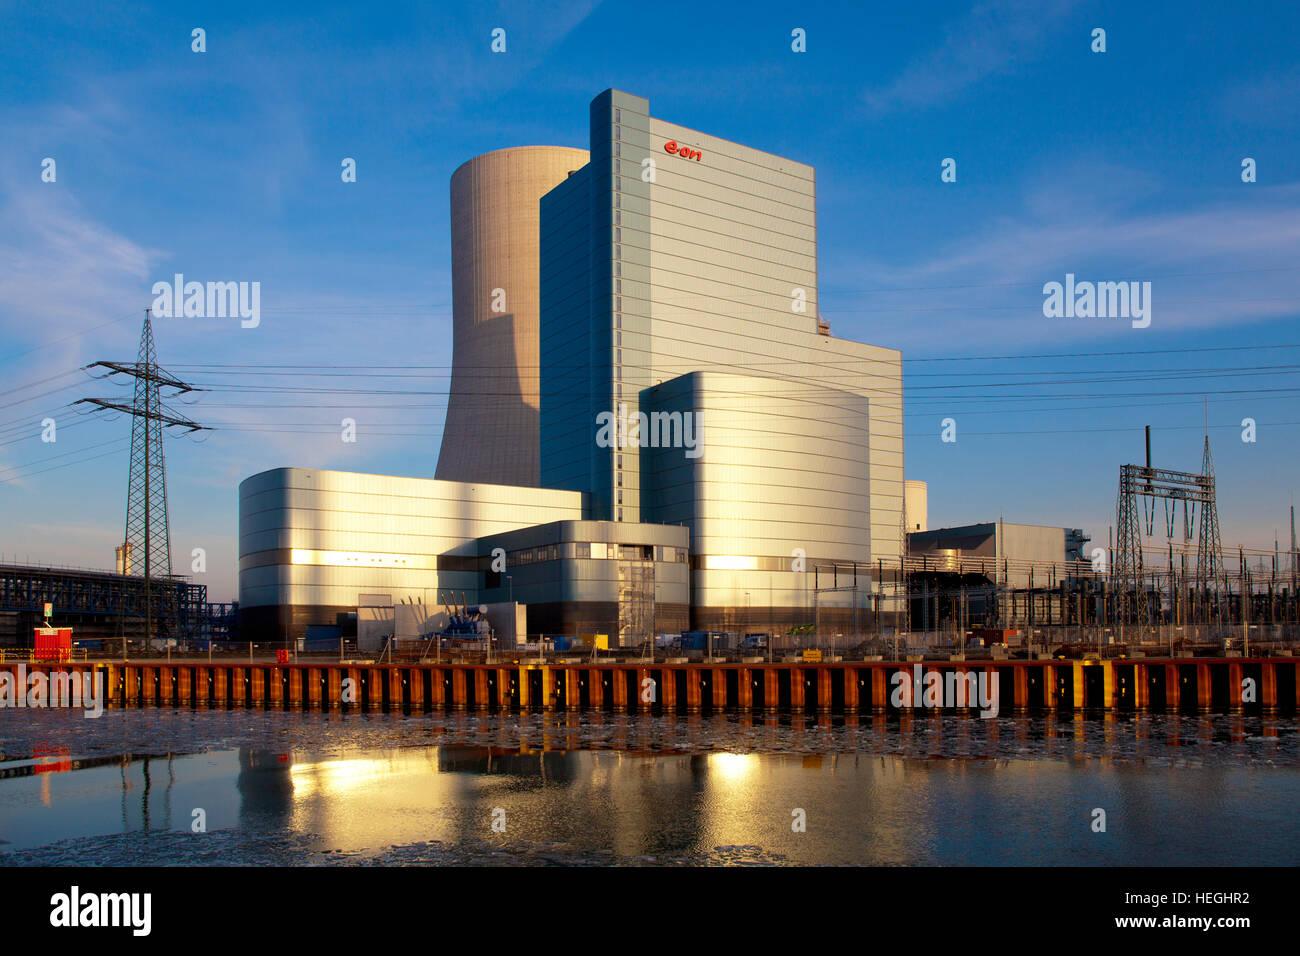 Germany, the E.on hard coal power station Datteln 4, Dortmund-Ems-Canal. - Stock Image